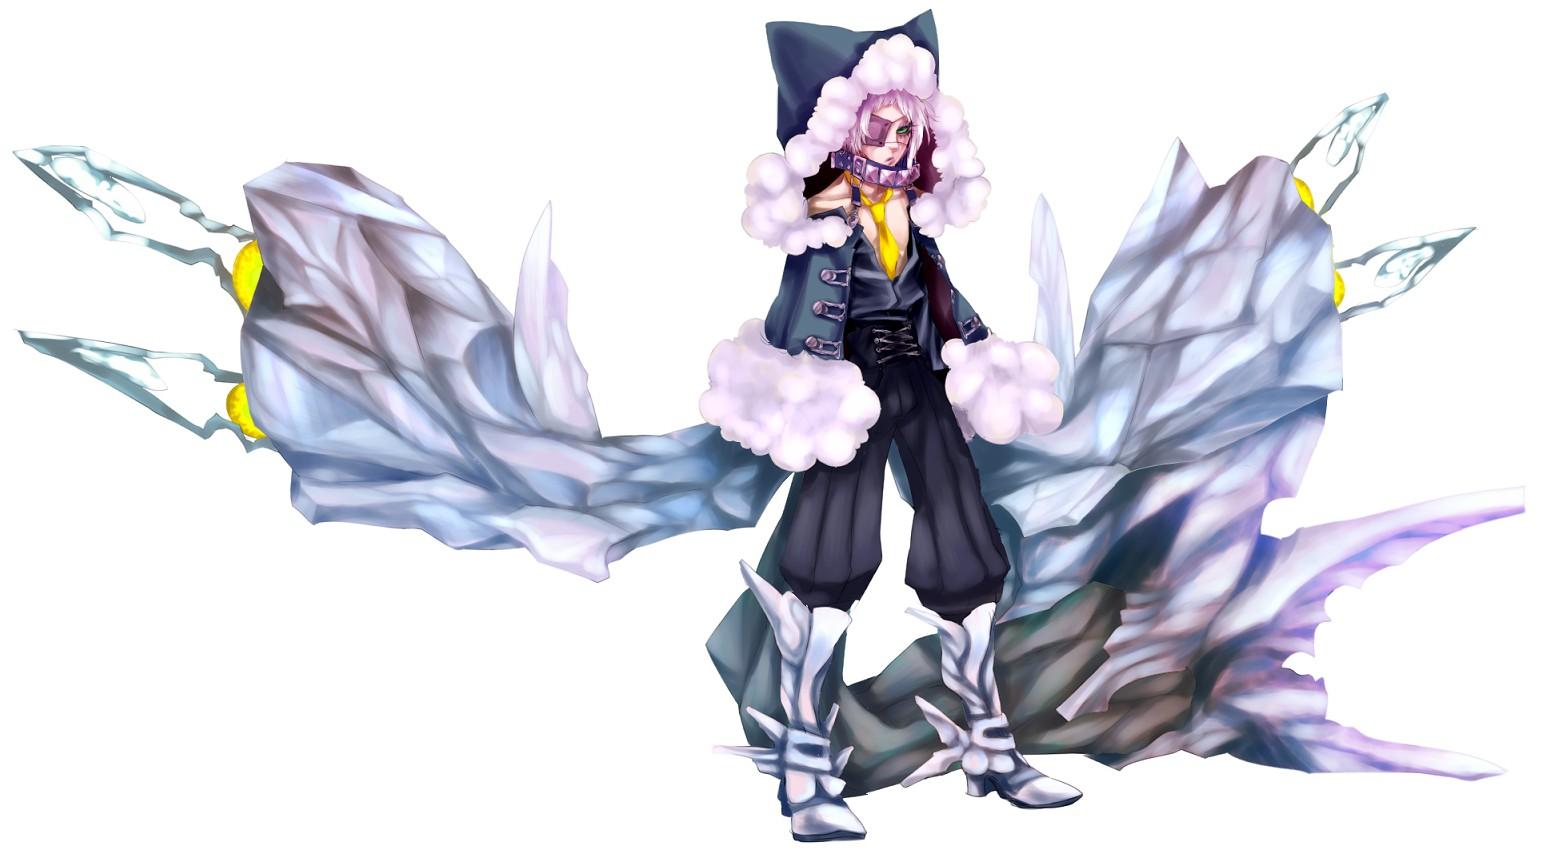 kyurem pokémon image 302113 zerochan anime image board